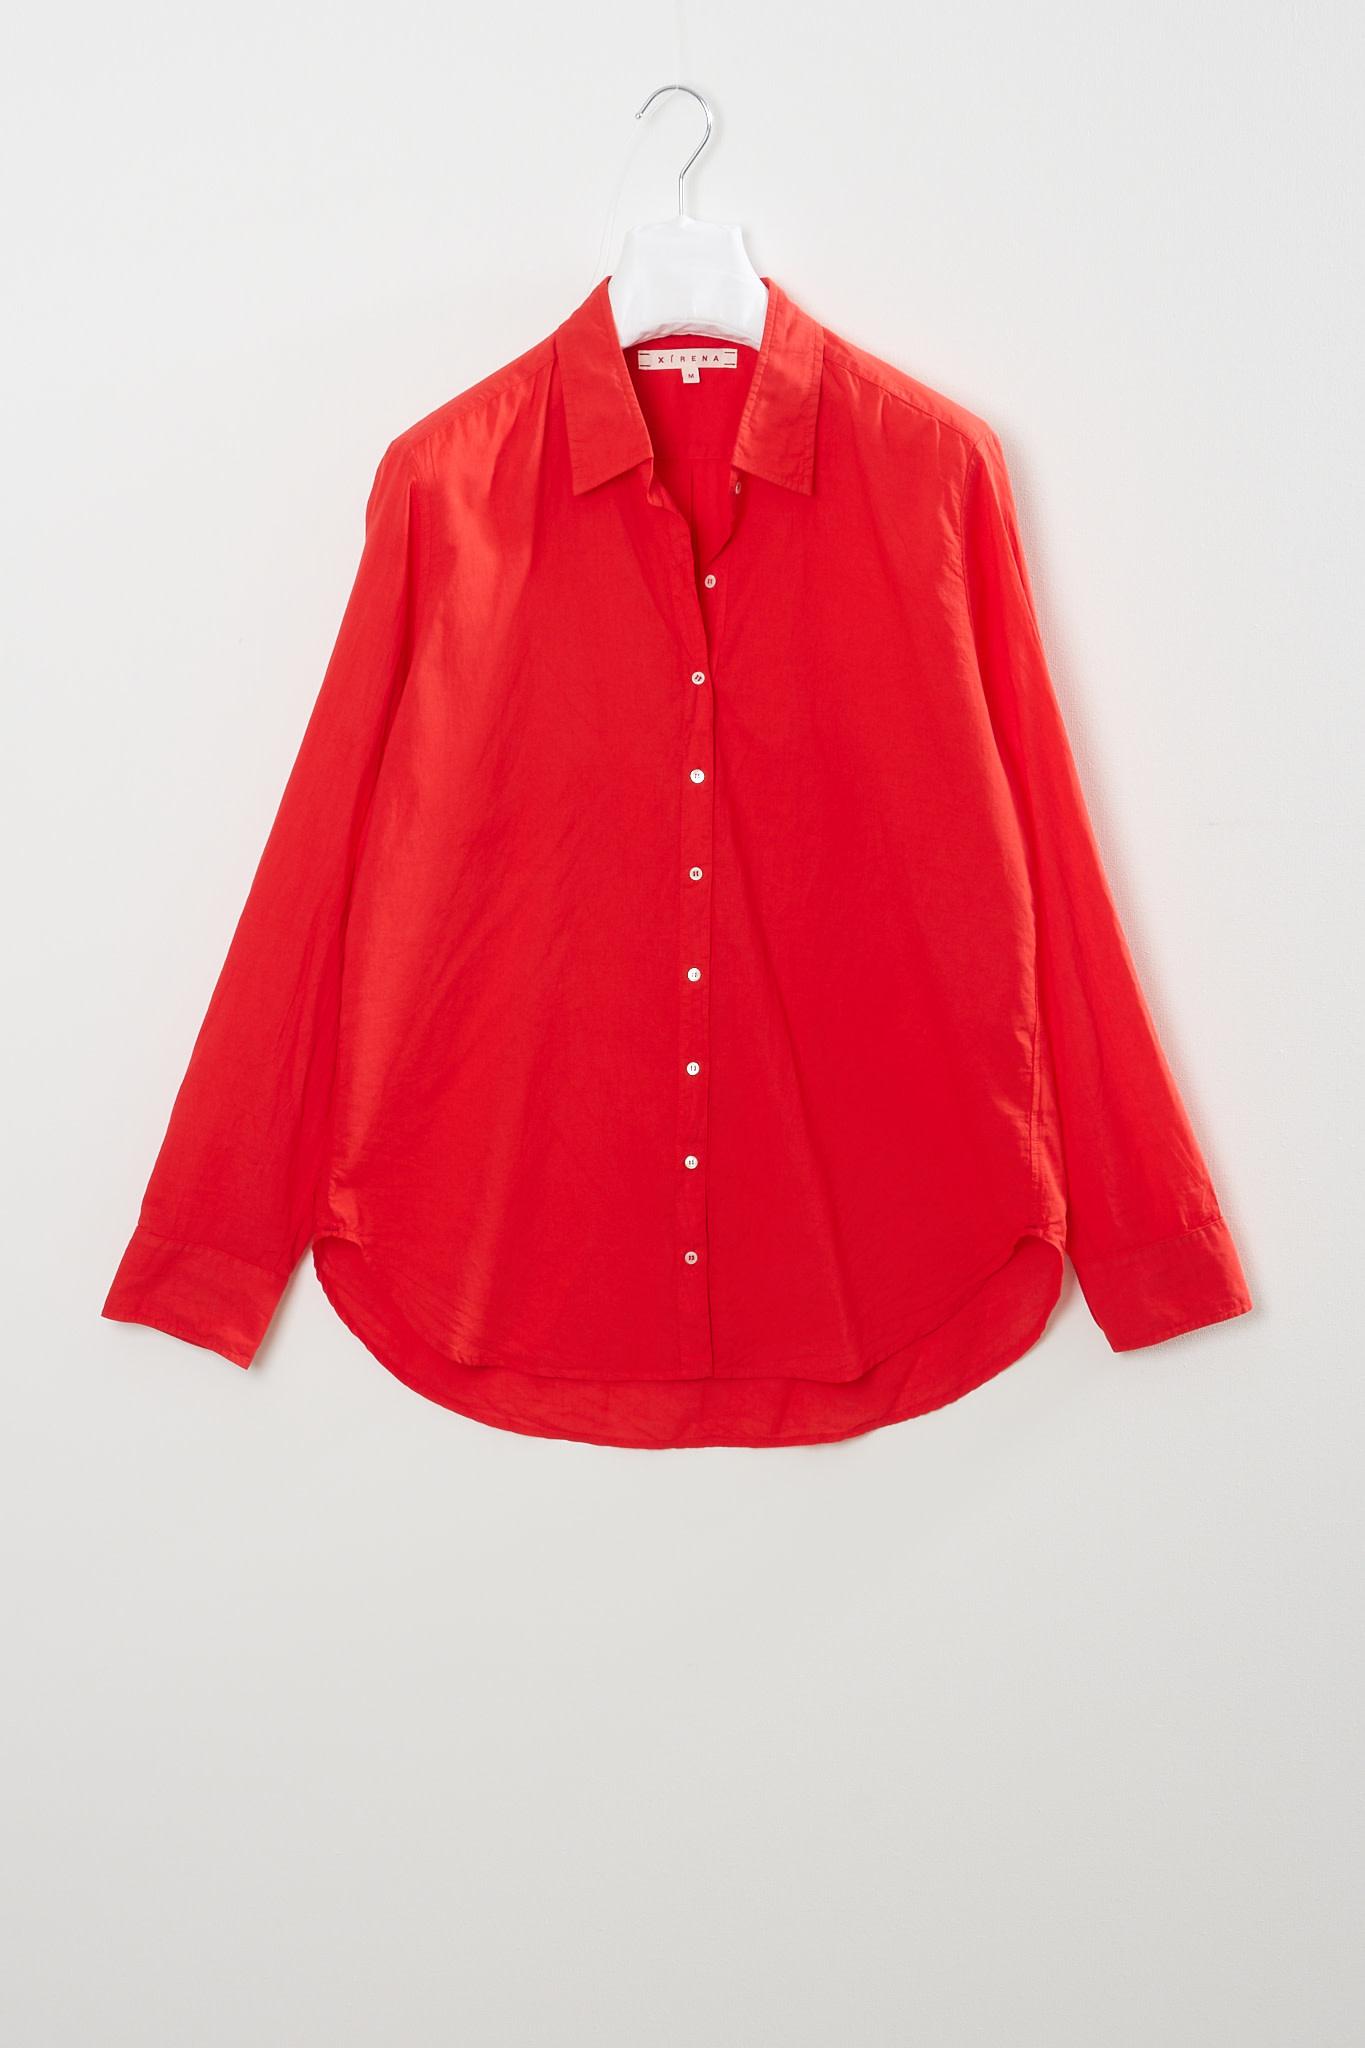 Xirena - Beau cotton poplin shirt red torch